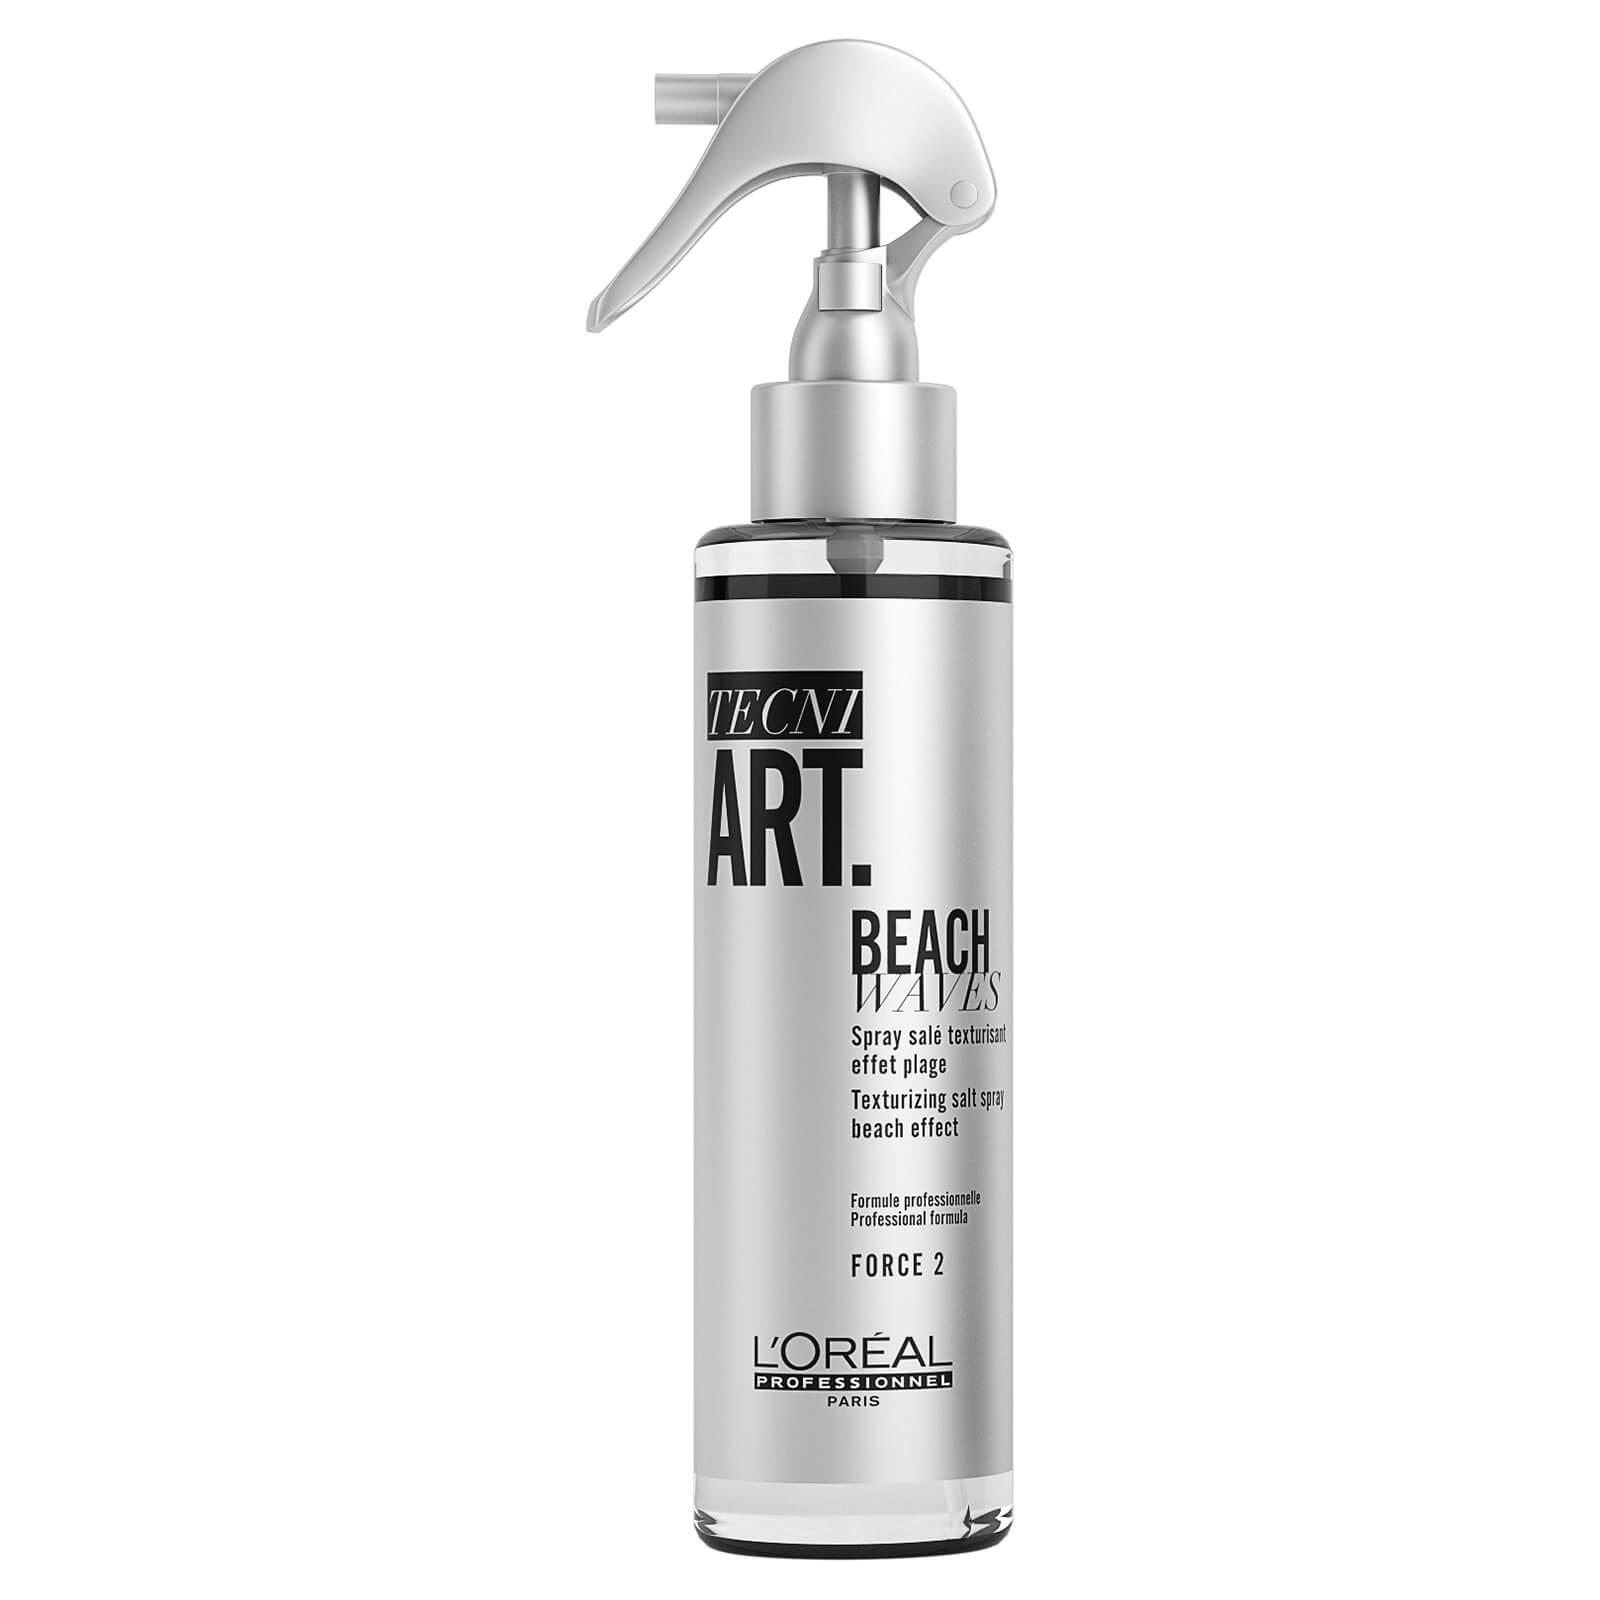 L'Oréal Professionnel Tecni.ART Beach Waves - 150ml